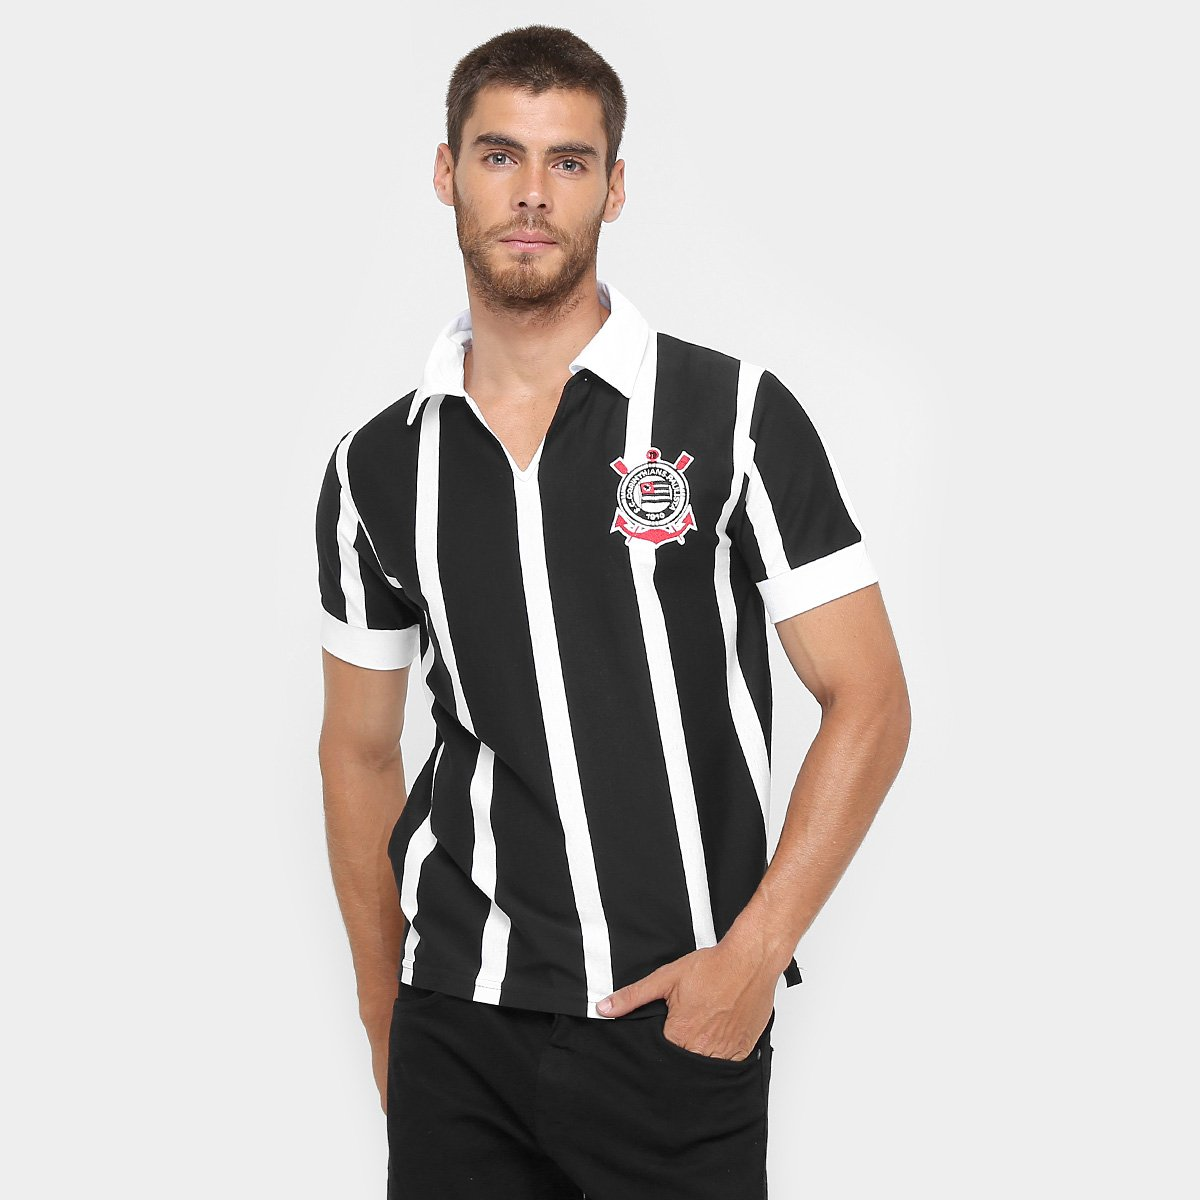 db5de5346f Camisa Polo Corinthians Réplica 1954 - Compre Agora